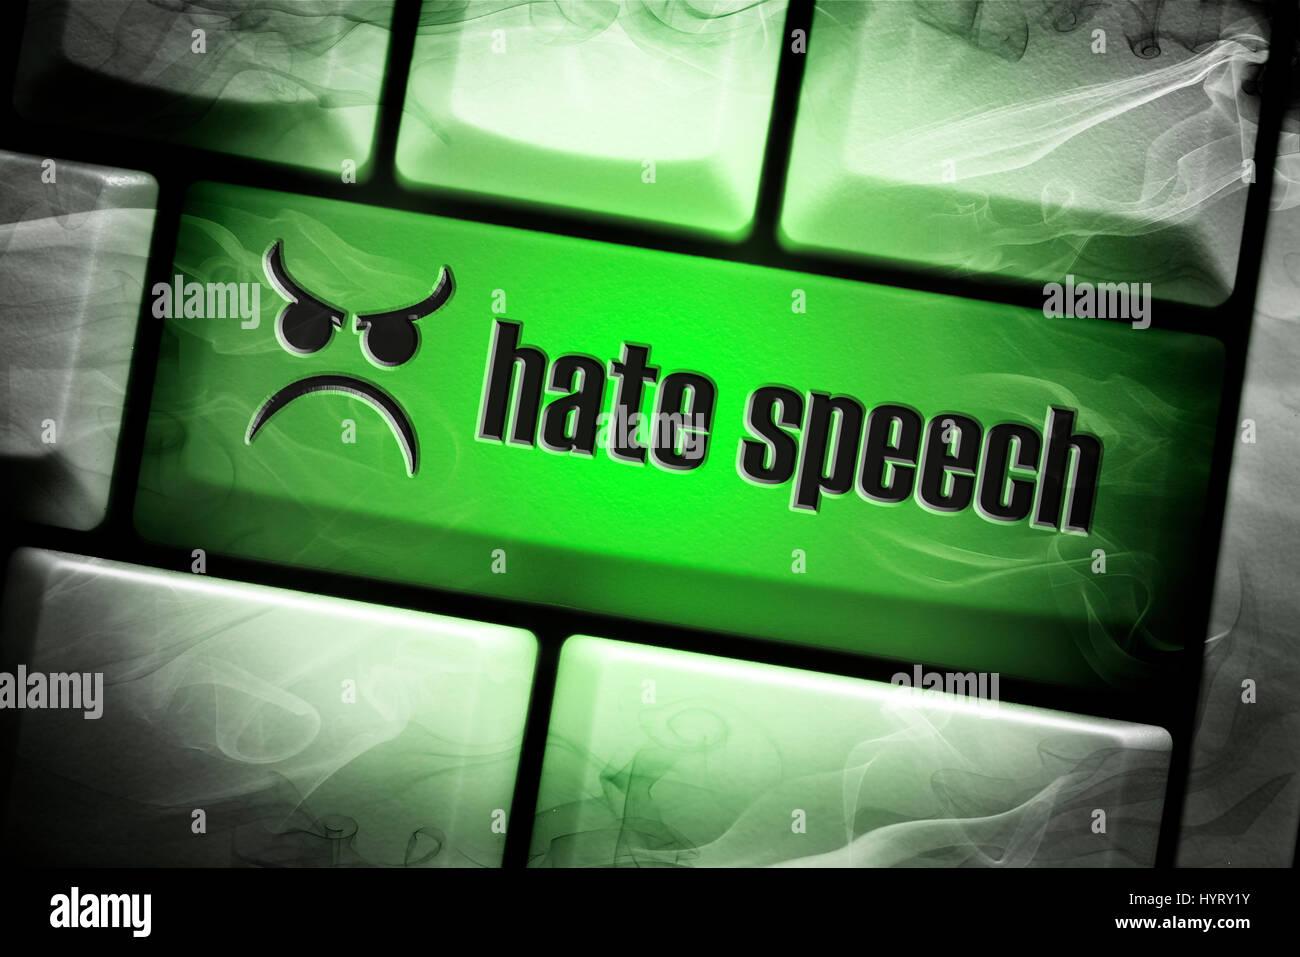 Hate speech key on computer keyboard - Stock Image